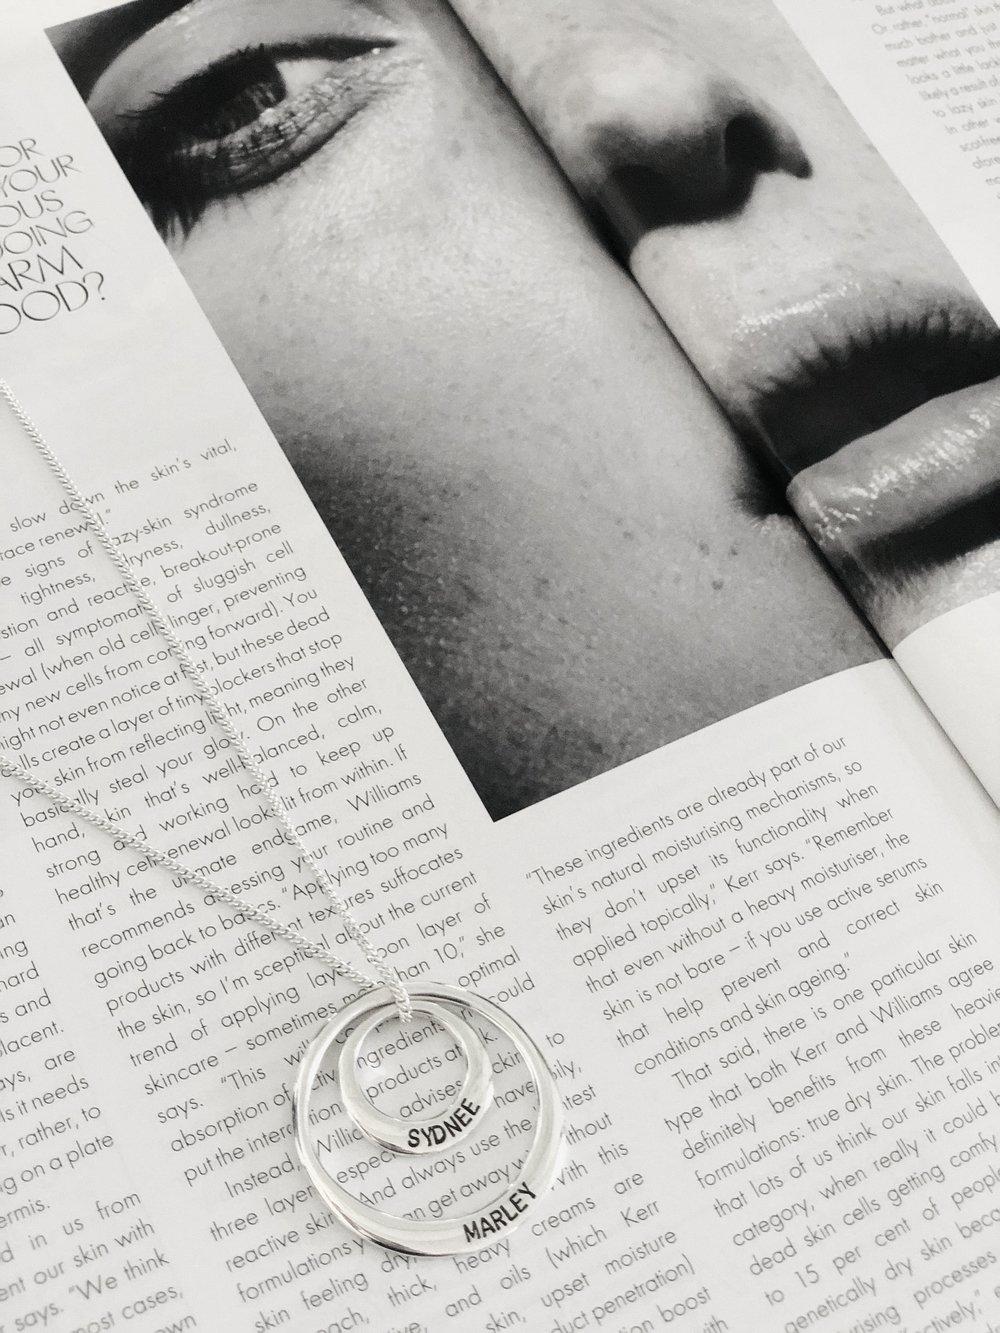 Stunning Heirloom Jewellery - For the modern woman